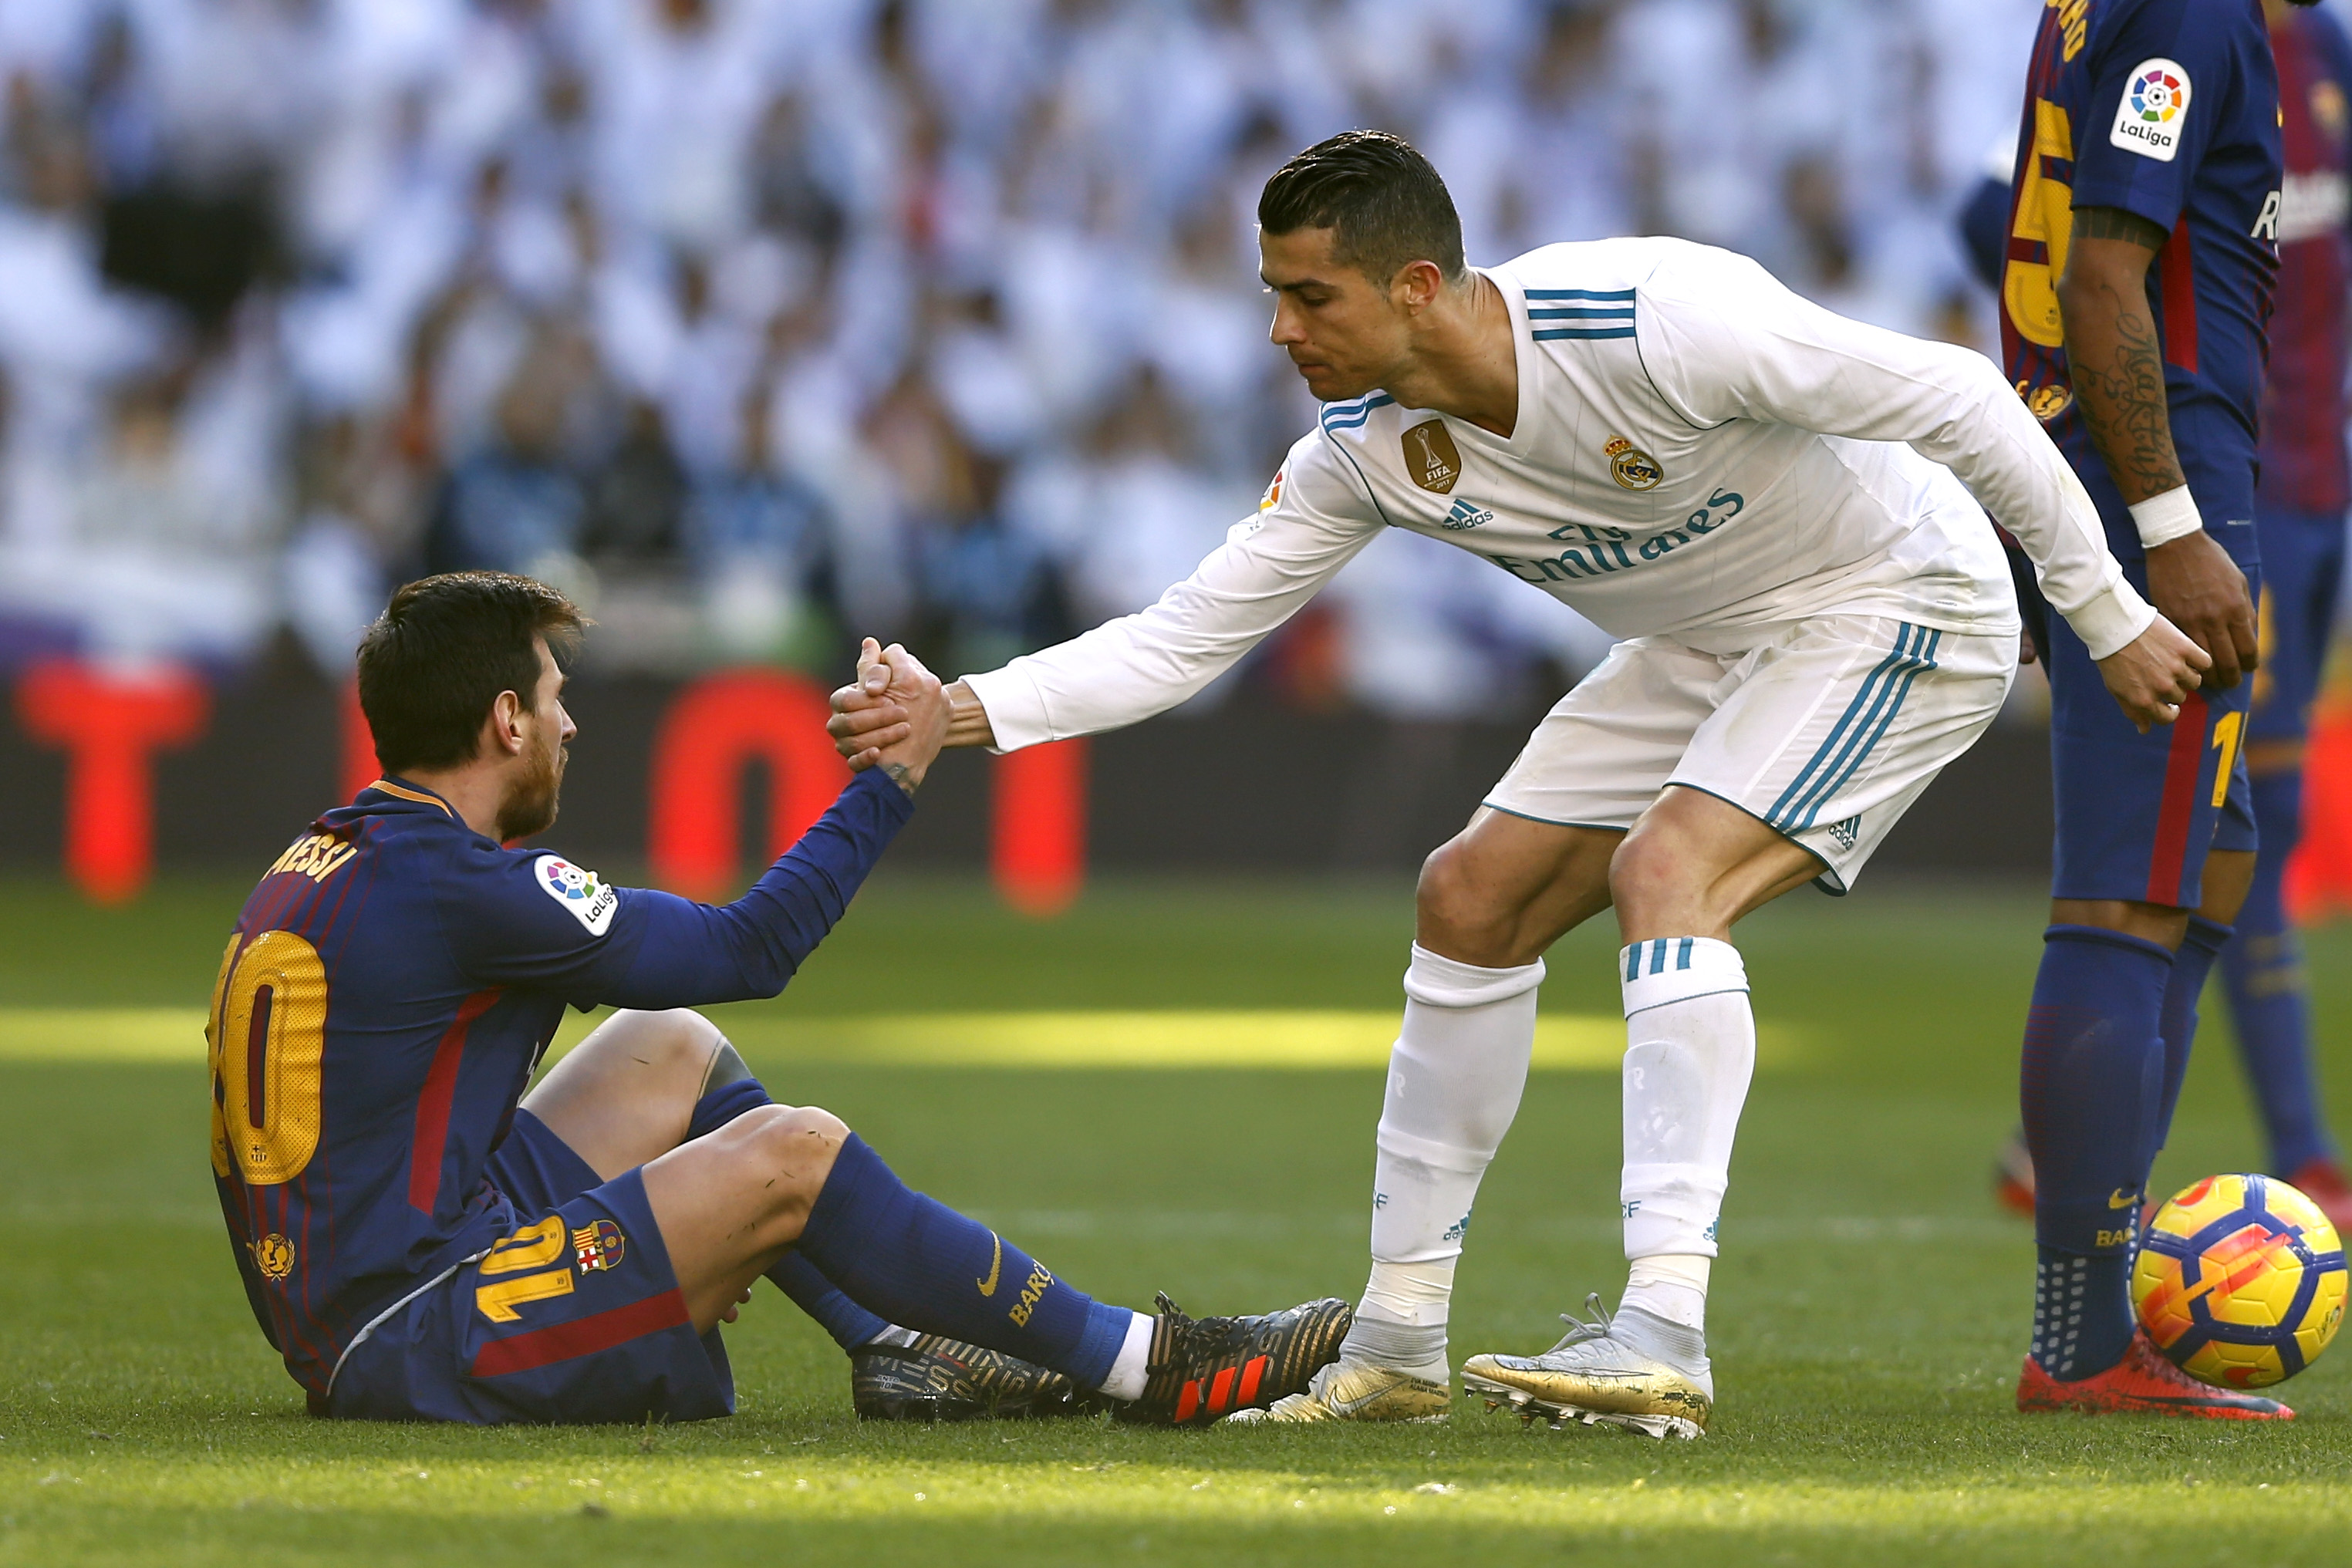 Cristiano Ronaldo helps Lionel Messi - Real Madrid v Barcelona - La Liga